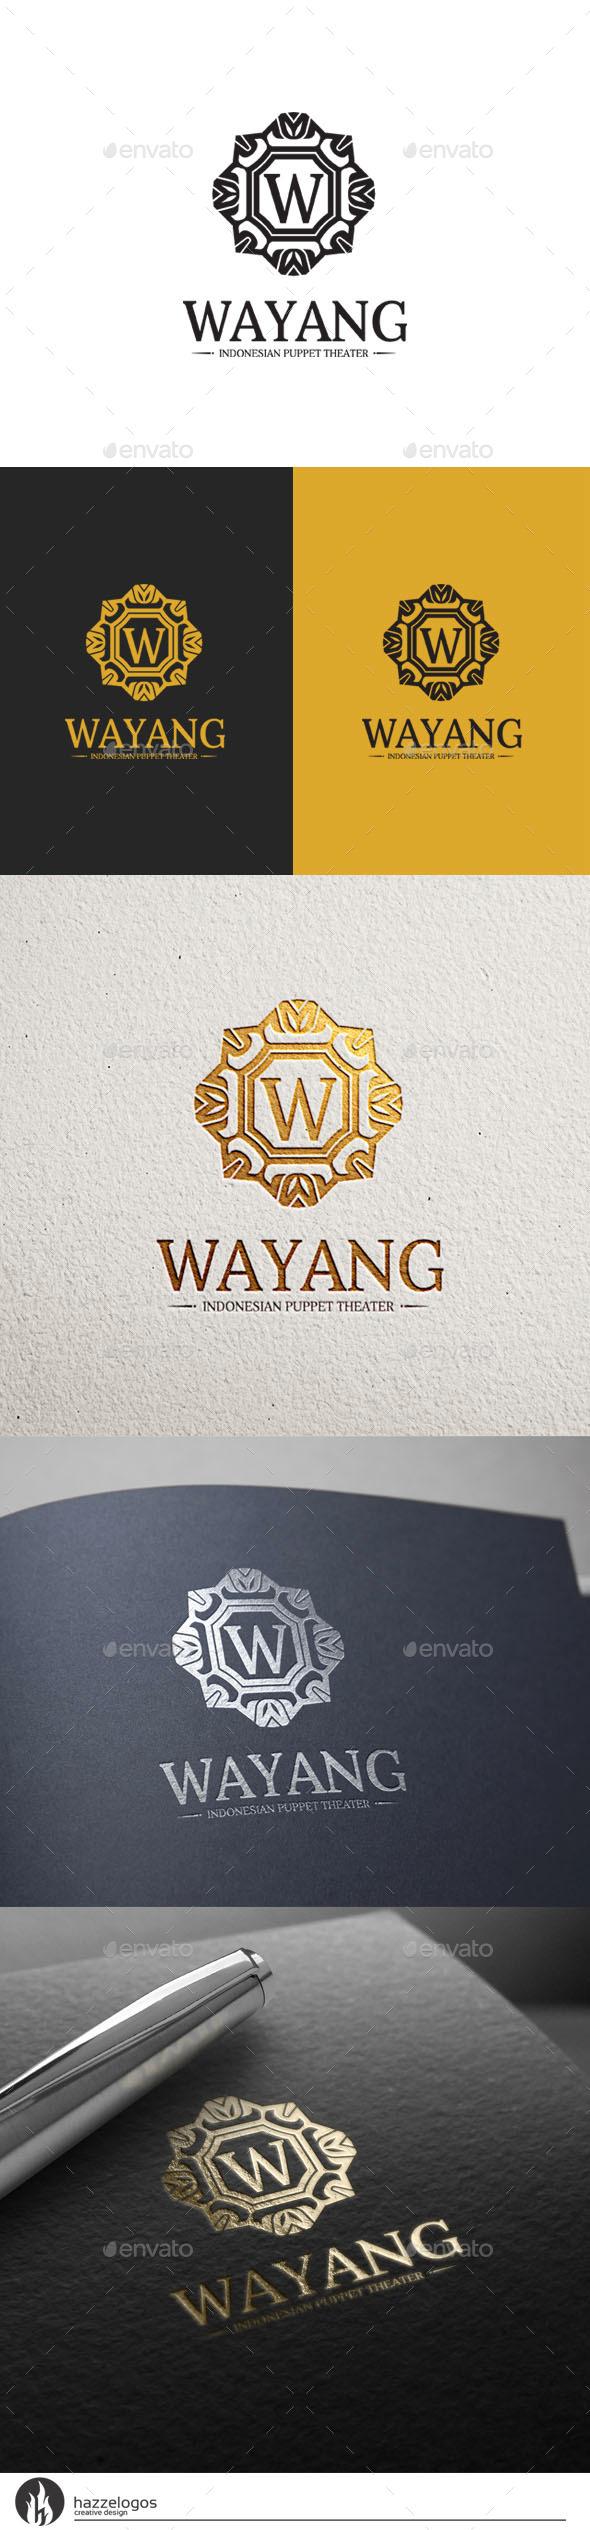 GraphicRiver Wayang Logo 10454876